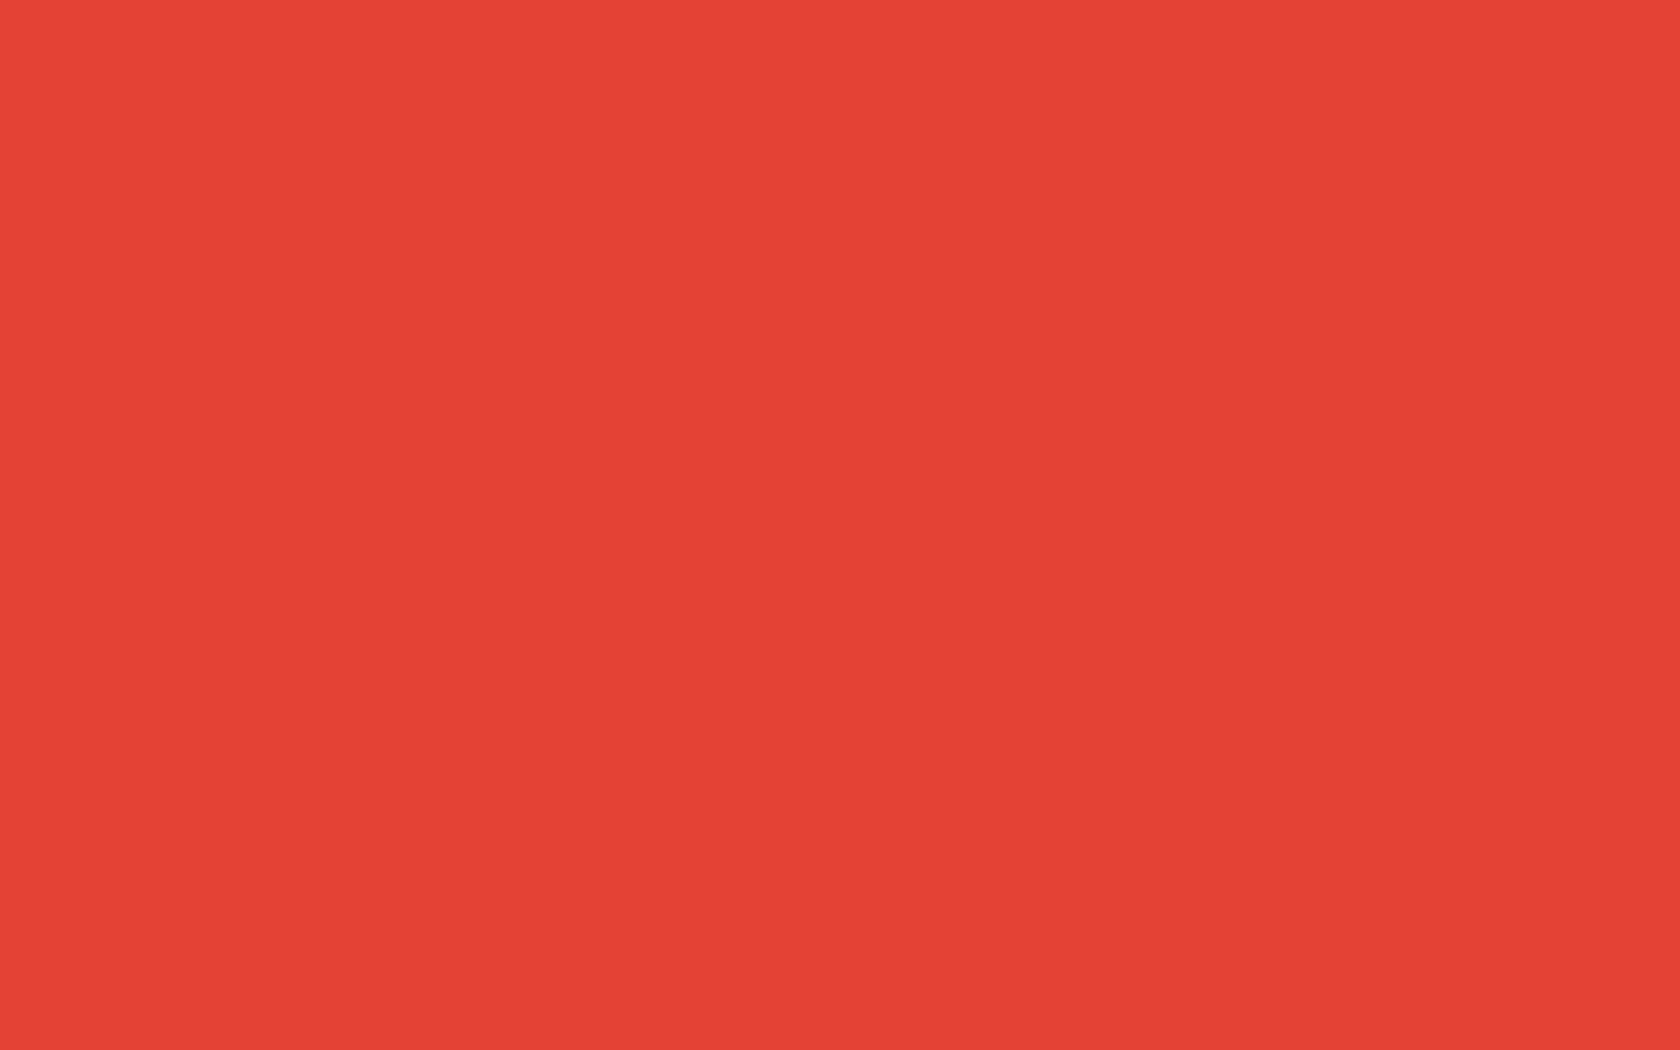 1680x1050 Vermilion Cinnabar Solid Color Background